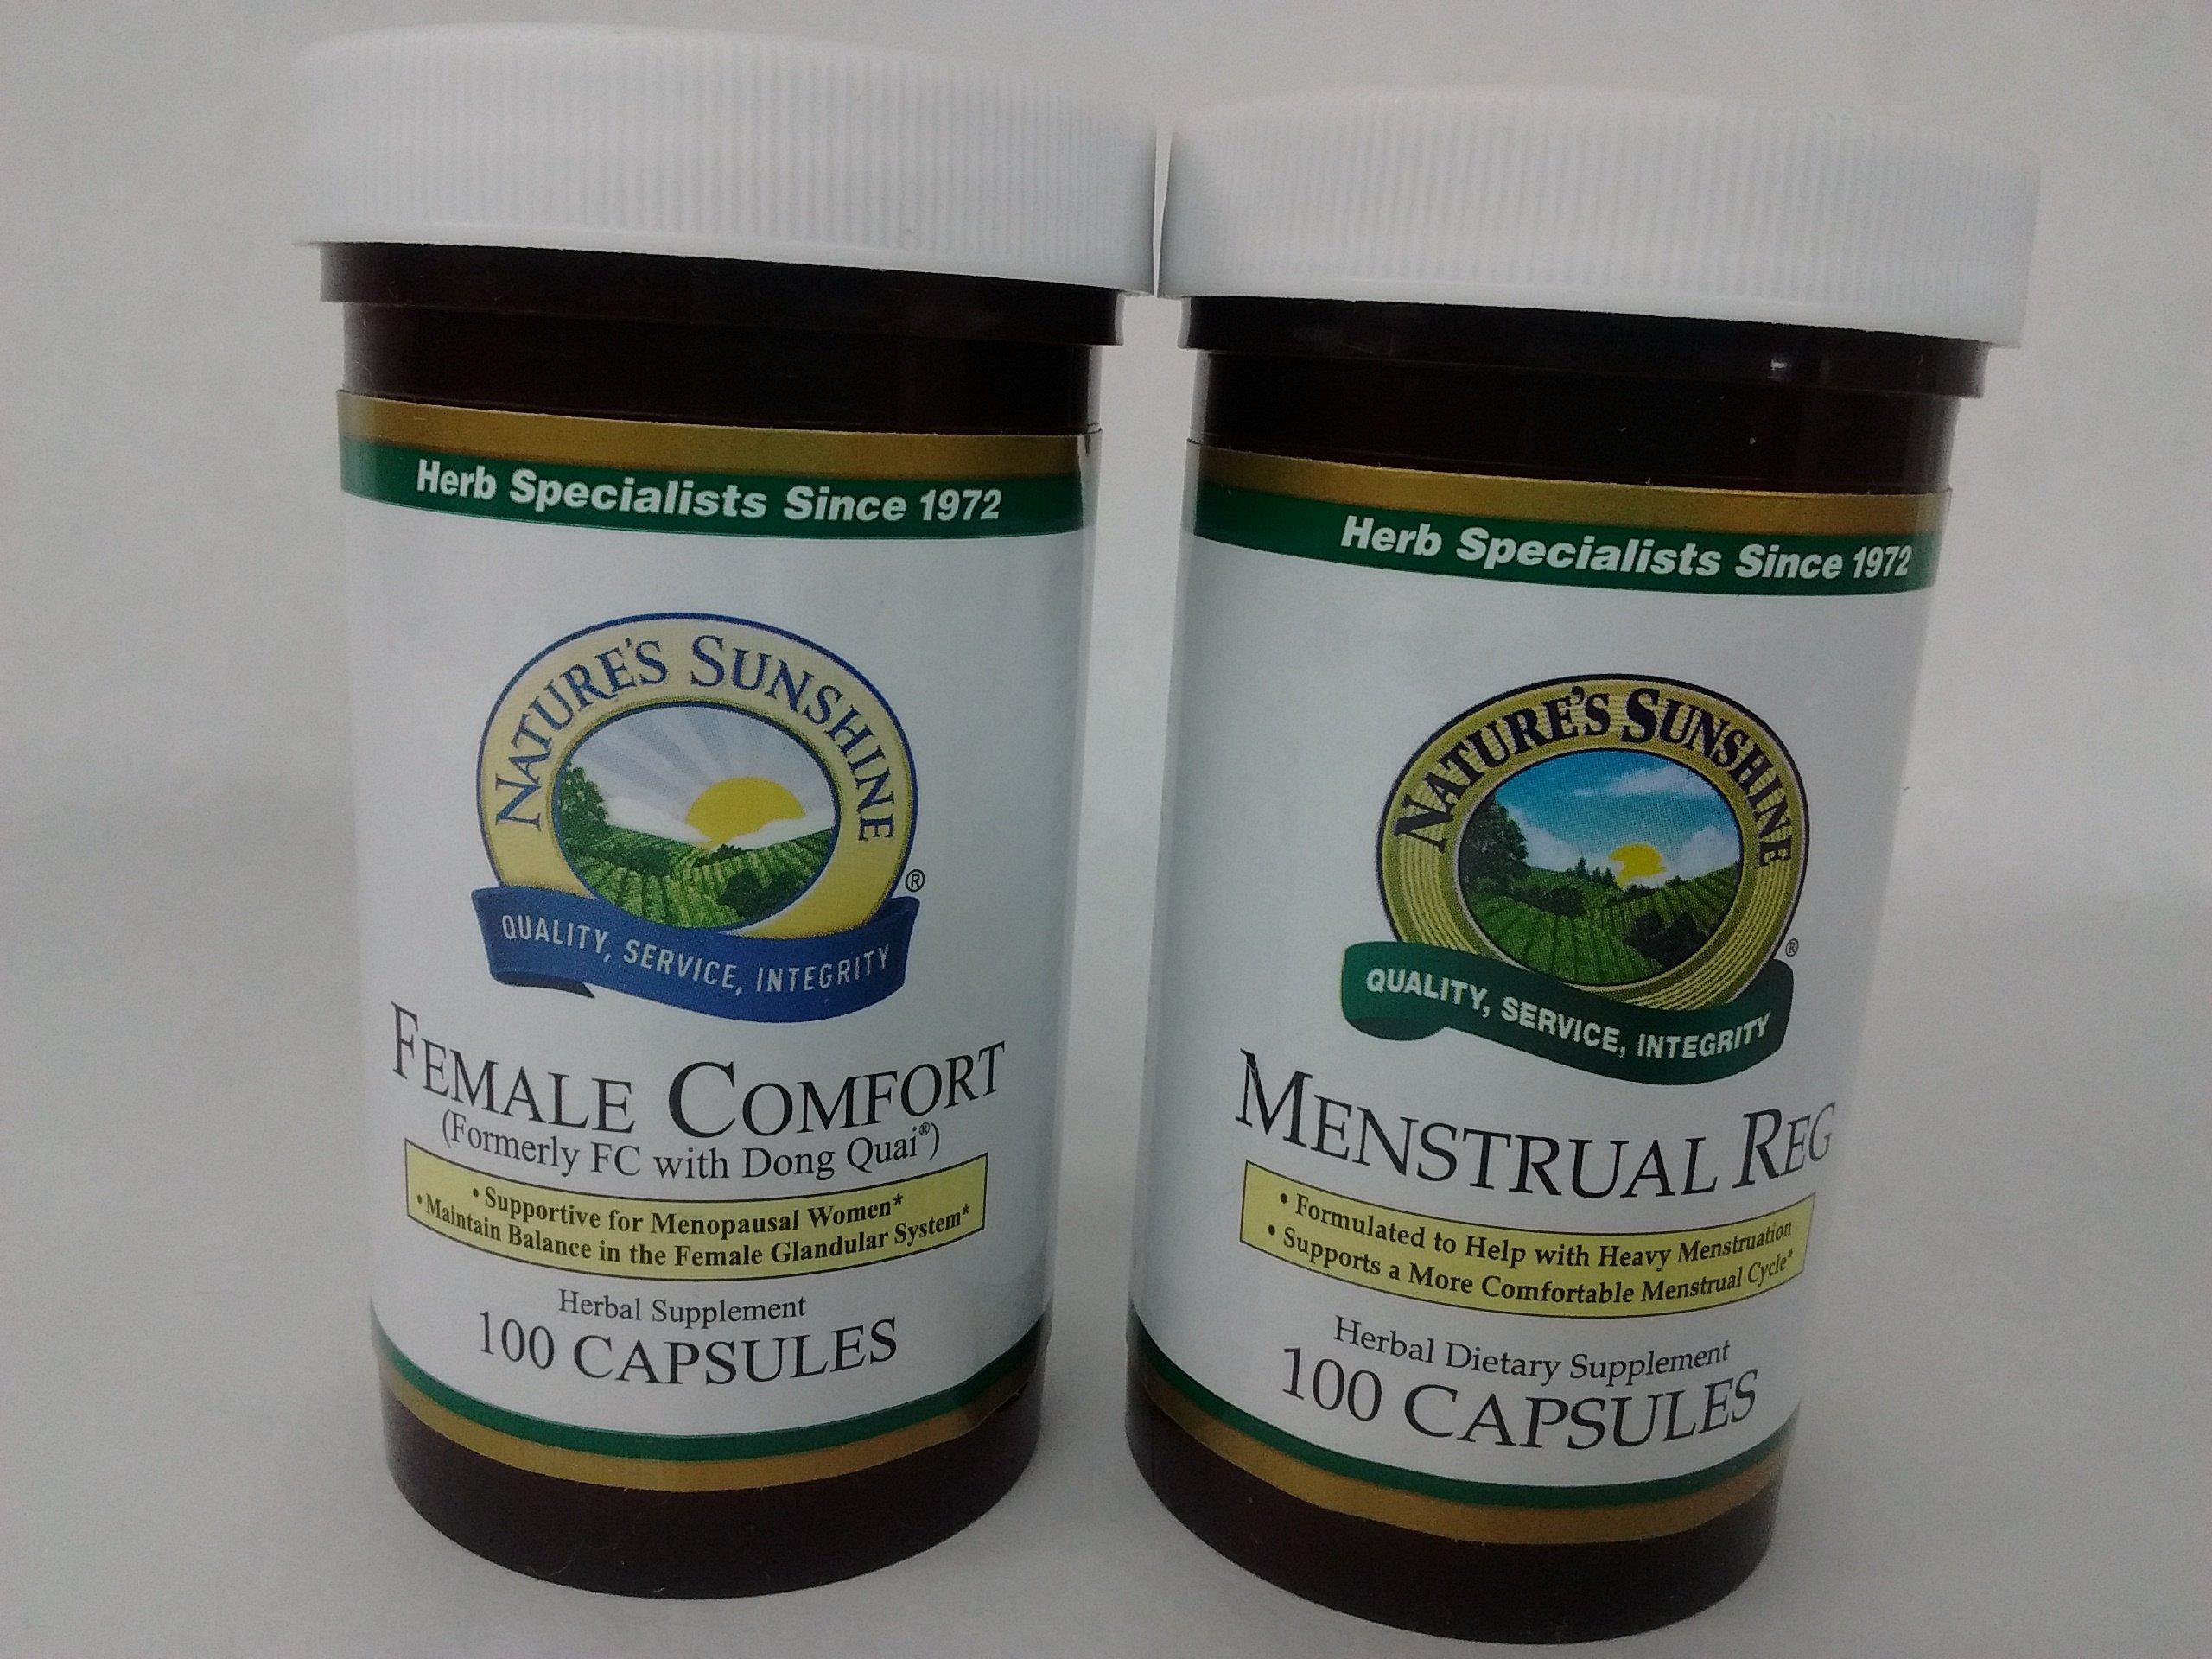 Female Comfort Menstrual Reg Bundle